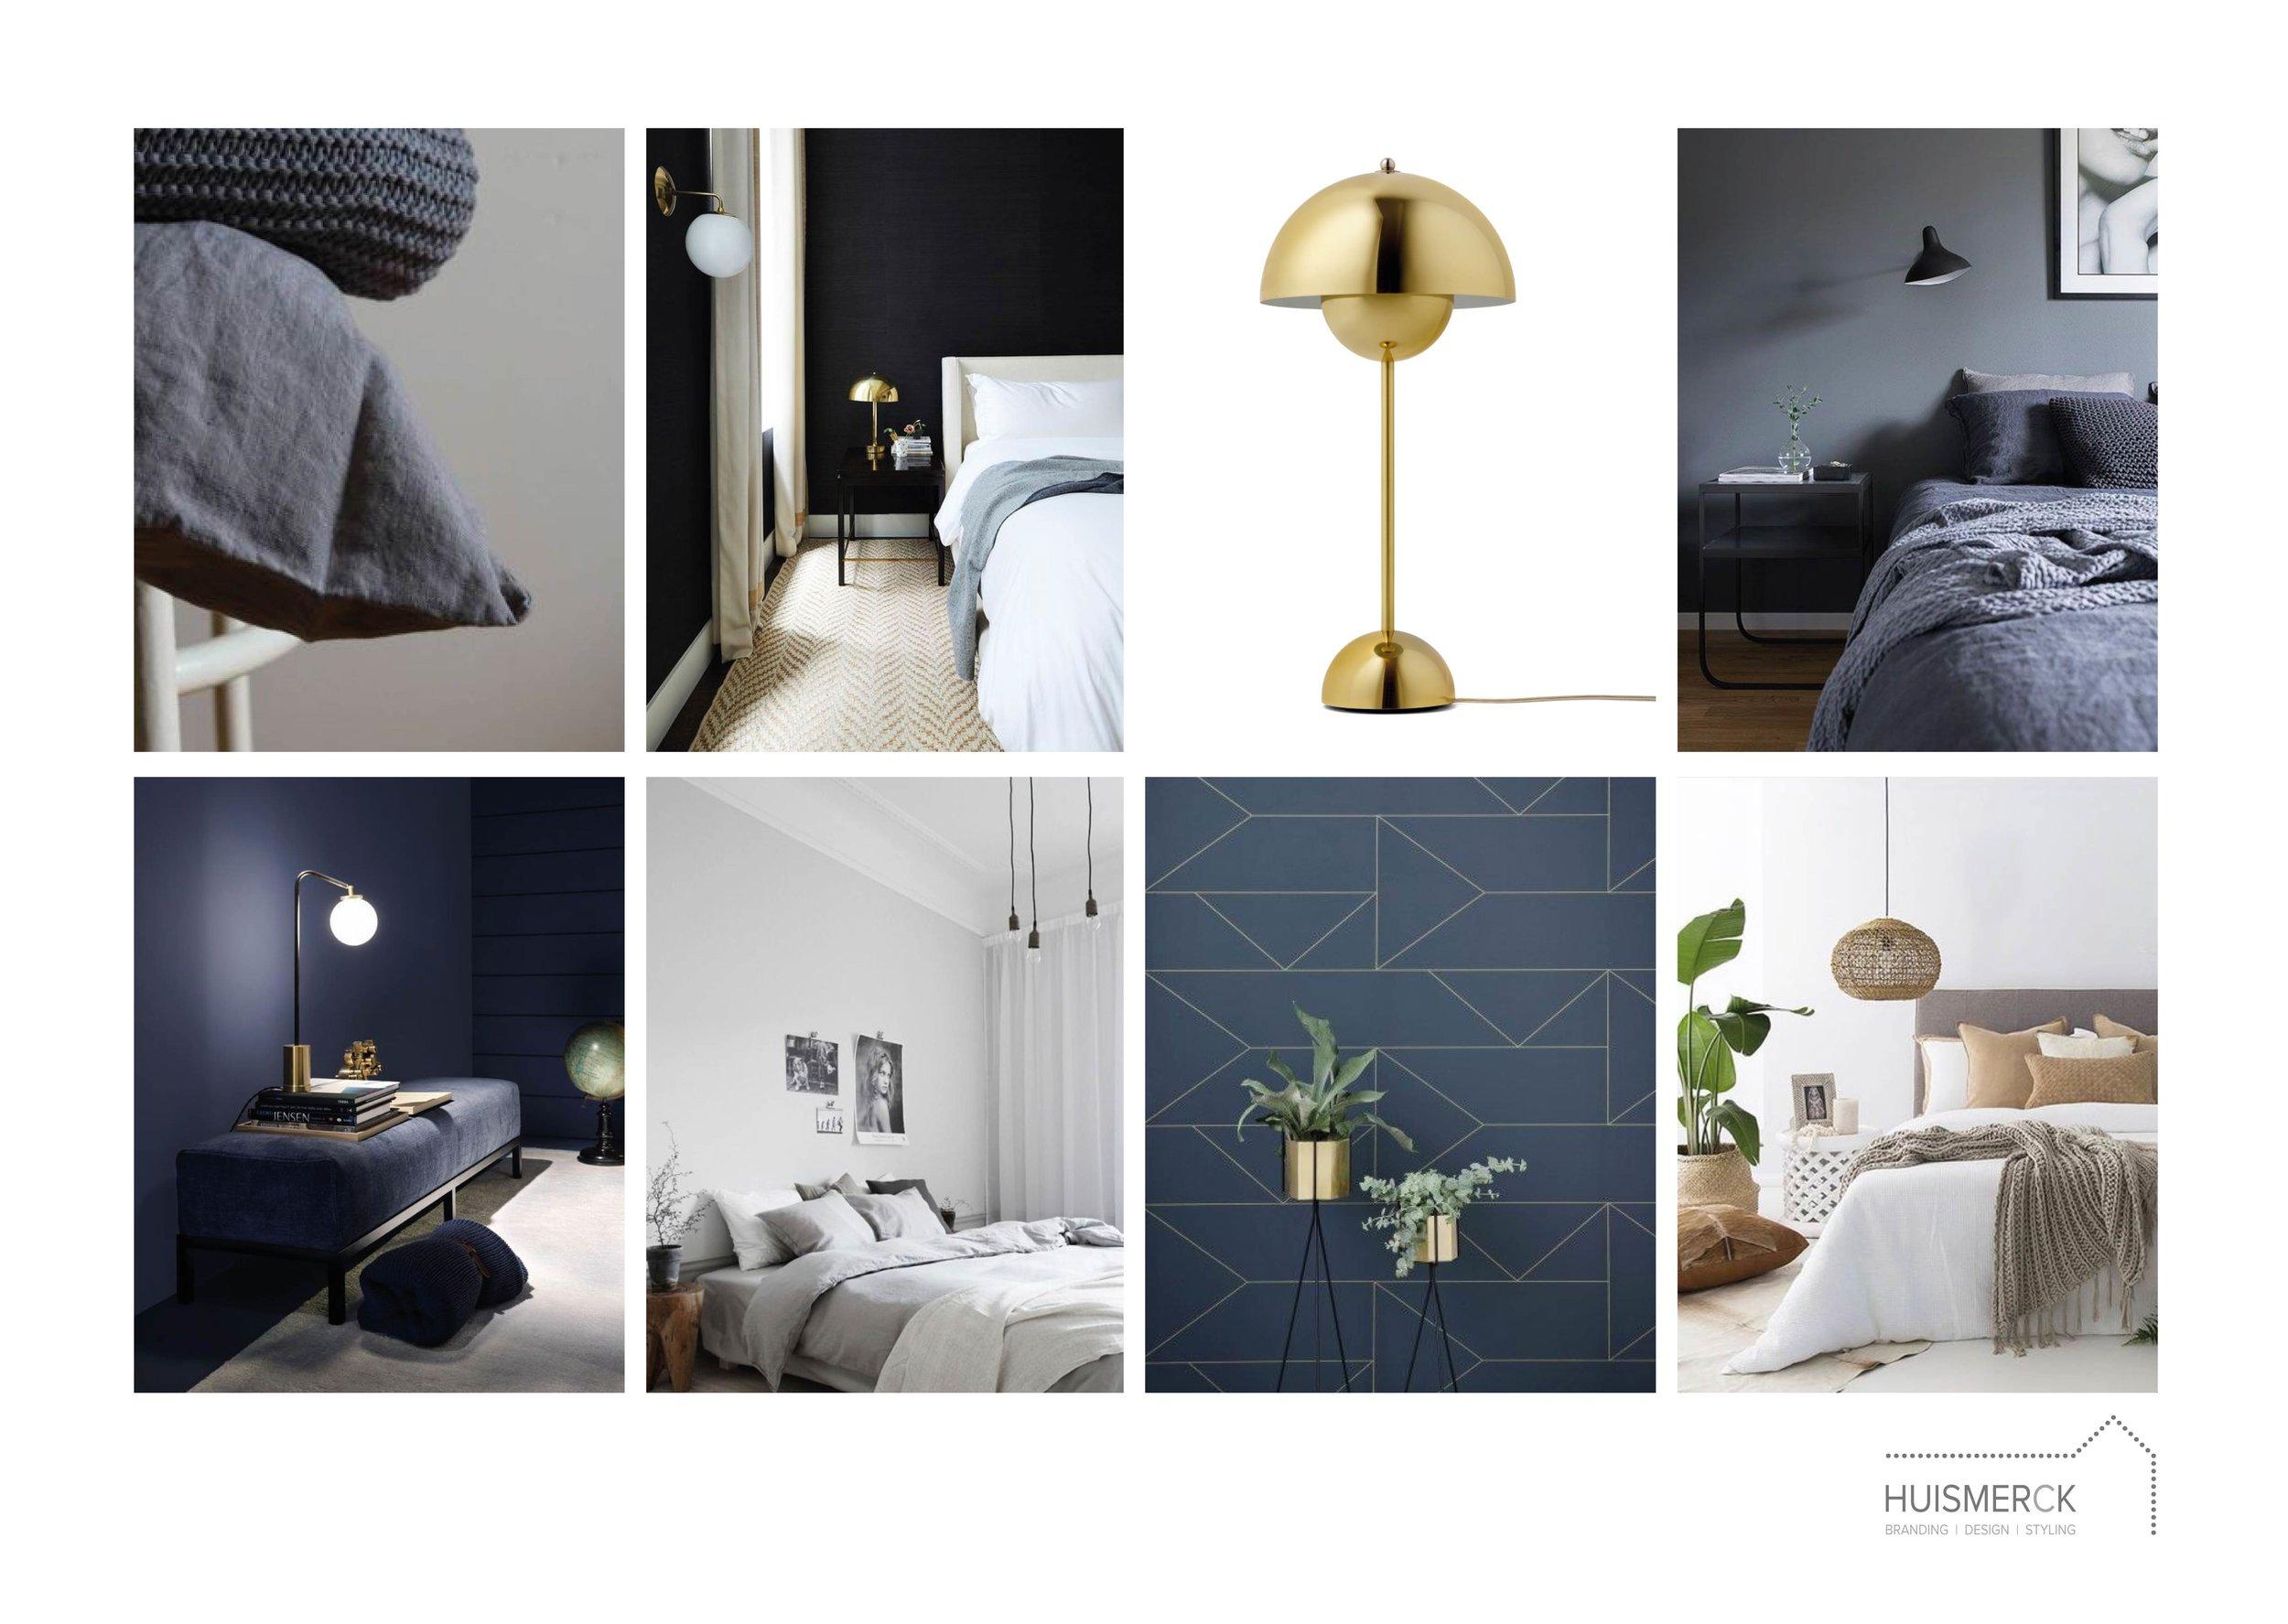 HUISMERCK®_Stylingadvies_Kleuradvies_Moodboard_Slaapkamer_master_bedroom_Marieke_en_Laurens_Enschede - v1.0.jpg